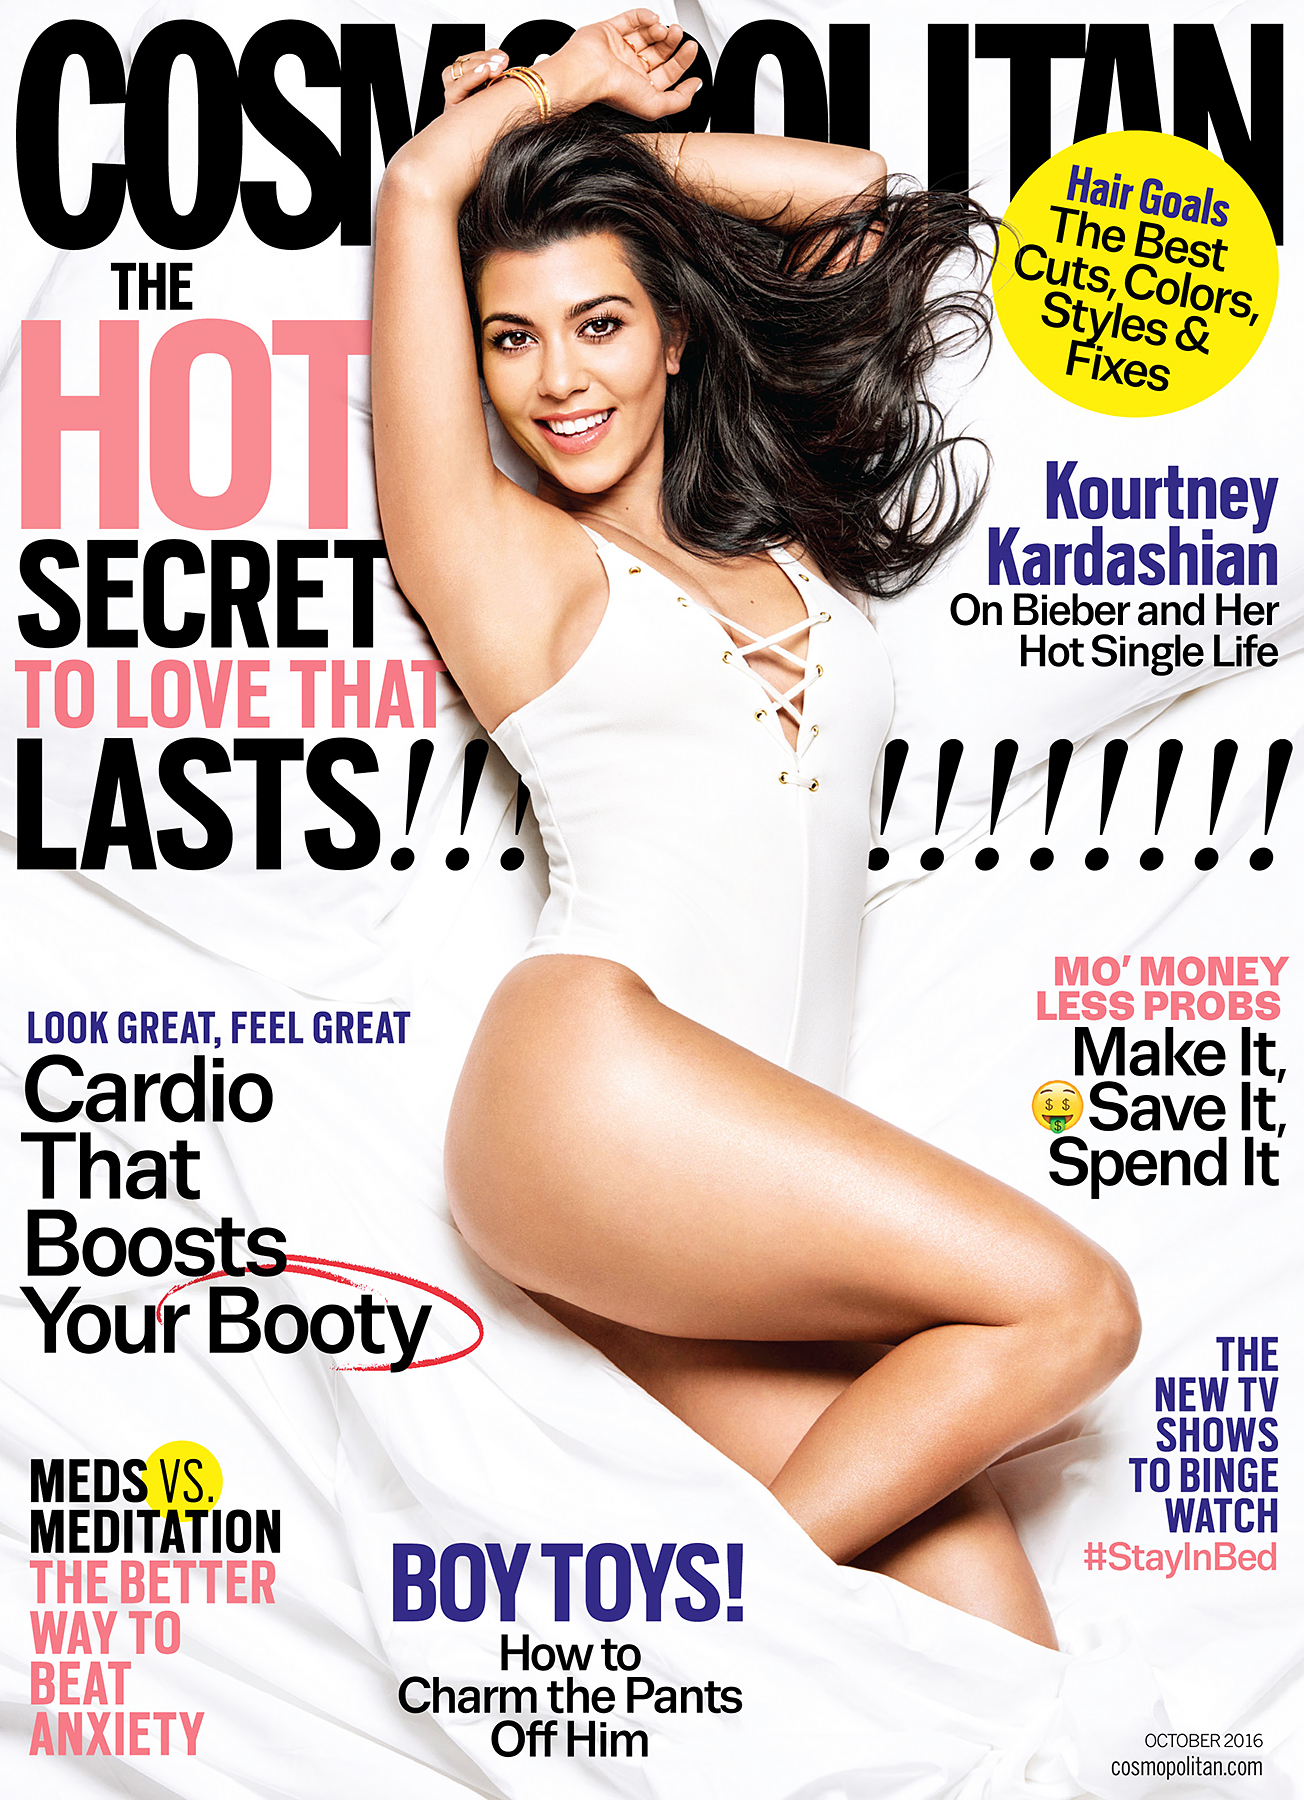 Kourtney Kardashian on Cosmopolitan cover